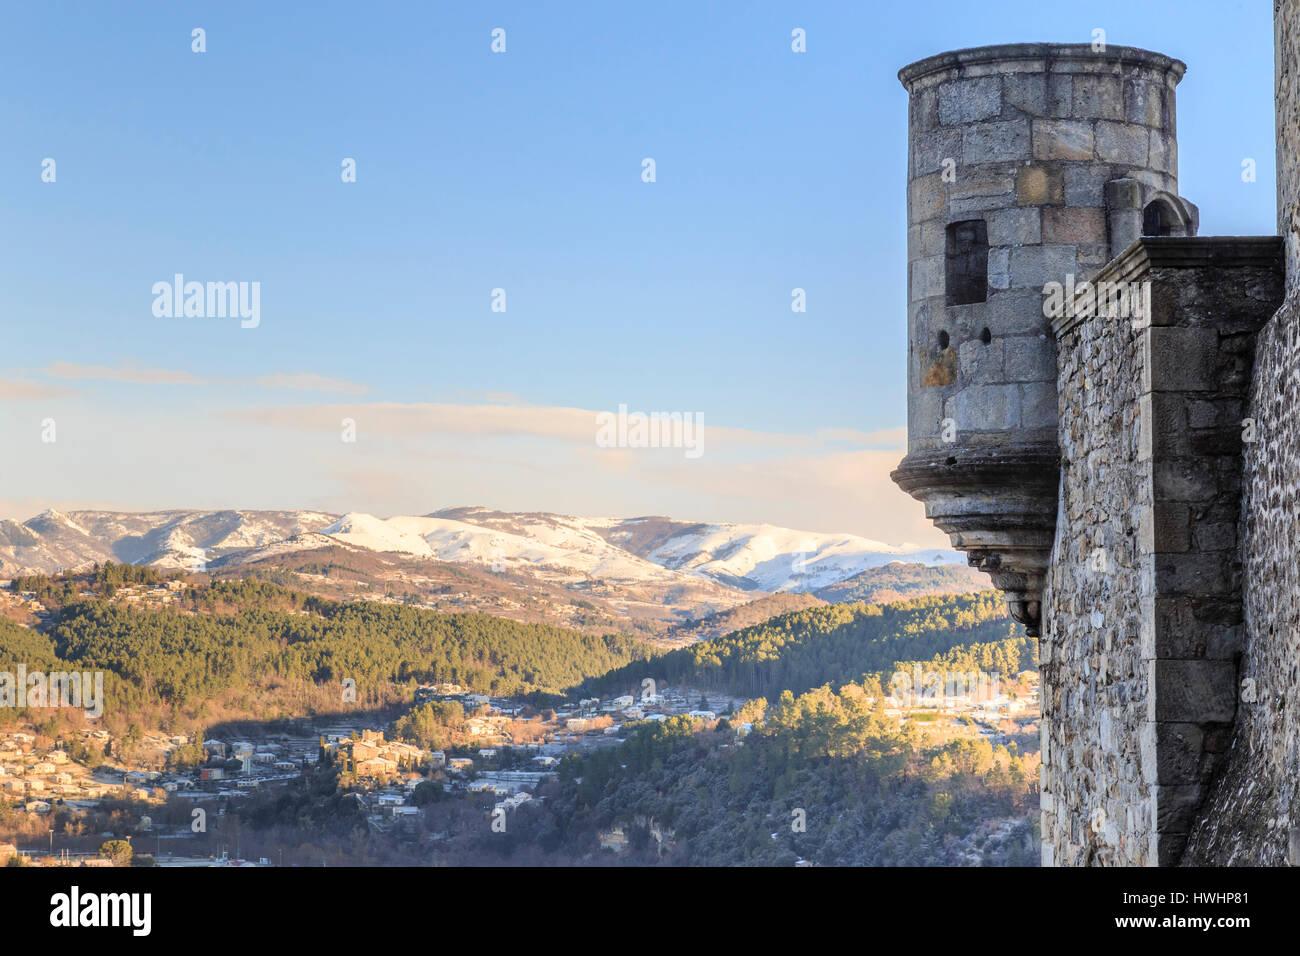 France, Ardeche, Aubenas, bartizan of the castle - Stock Image